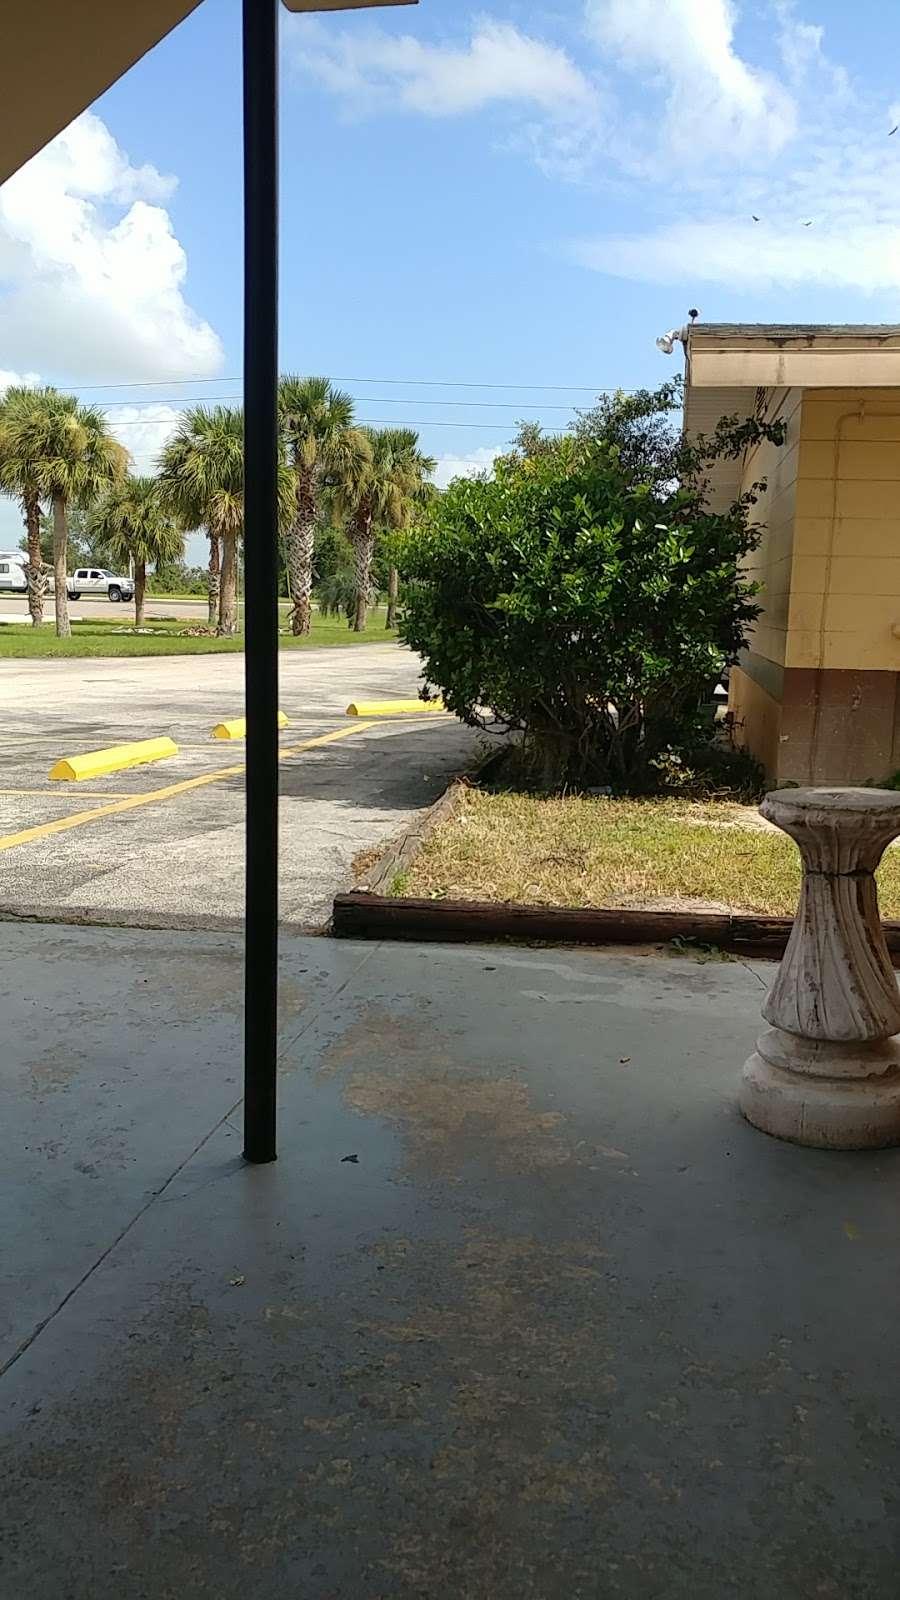 Monticello Motel LLC - lodging  | Photo 1 of 1 | Address: 28500 US-27, Dundee, FL 33838, USA | Phone: (863) 439-3276